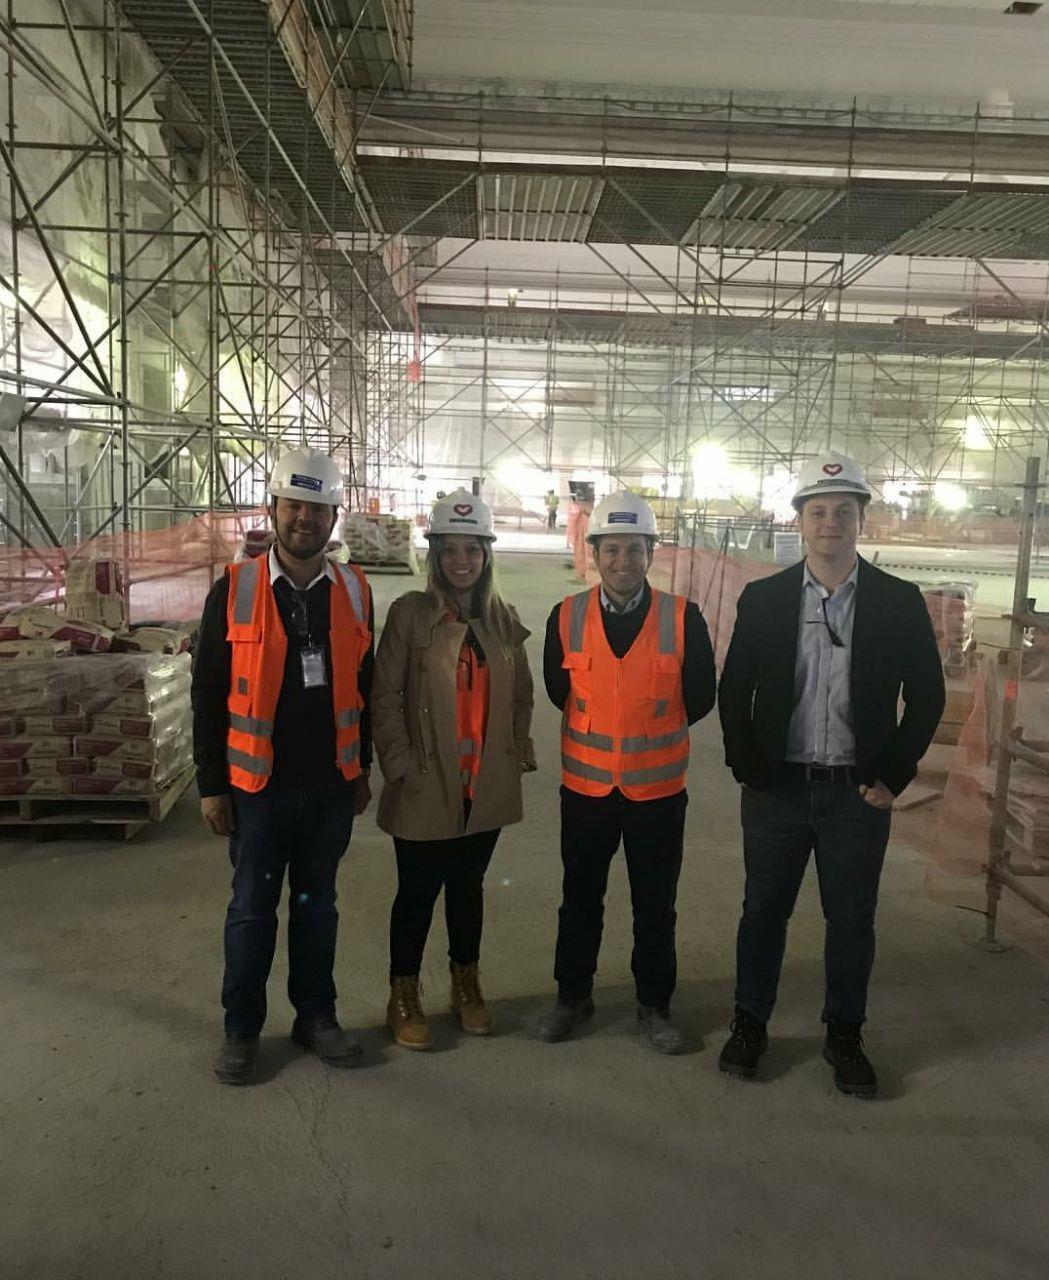 Deivson Vidal visita empreendimento em Curitiba